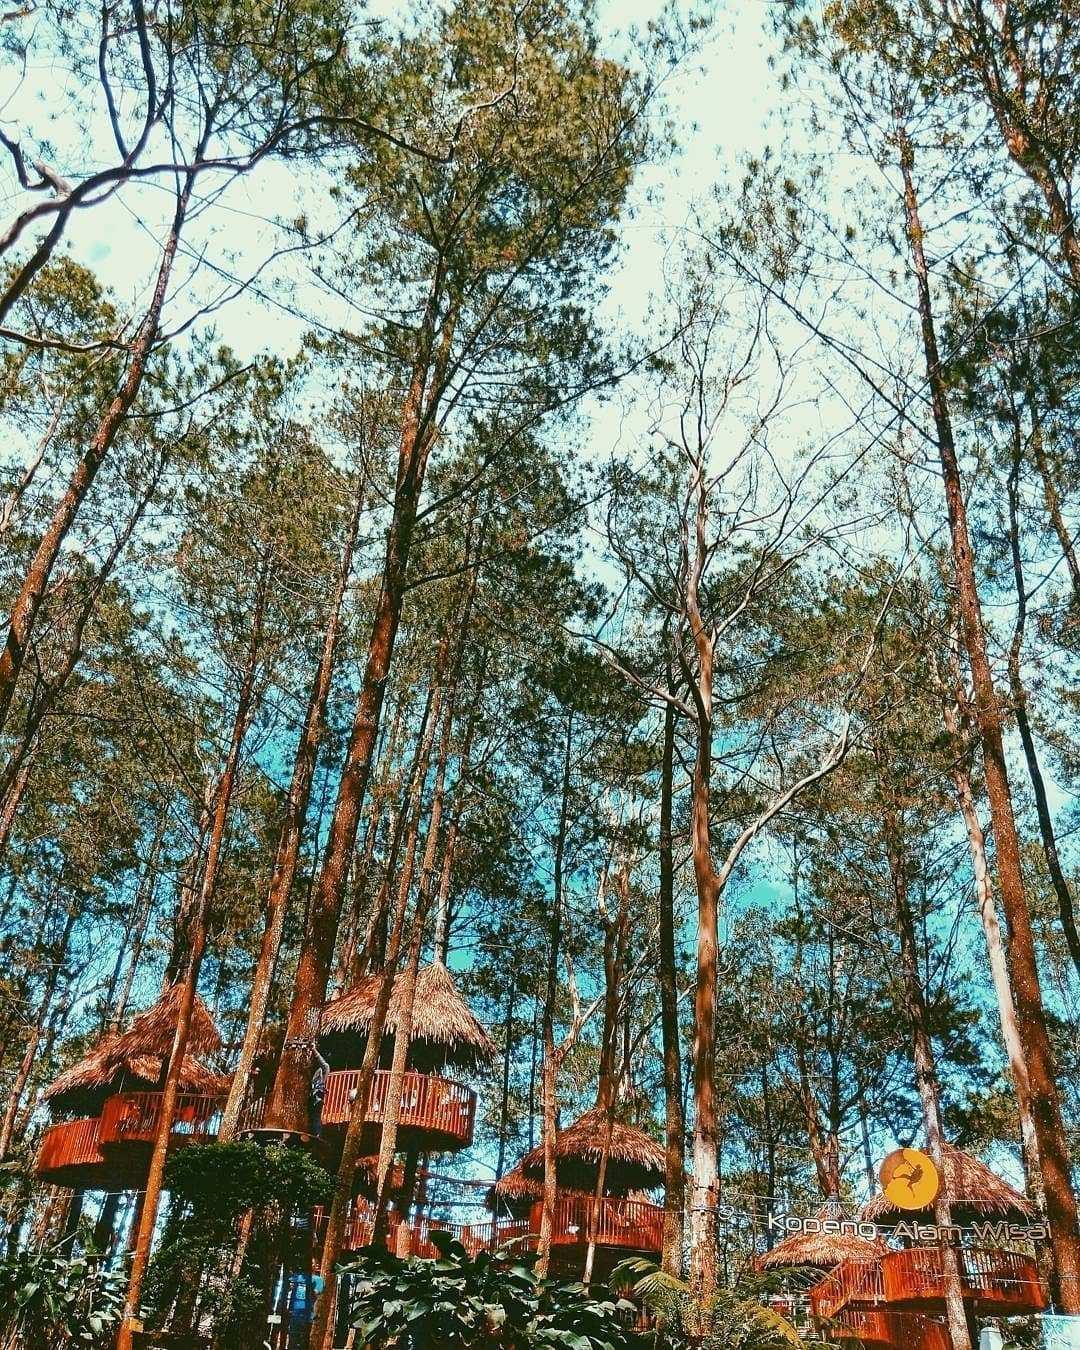 Sky Treetop di Kopeng Treetop Semarang, Image From @antonzvideochannel